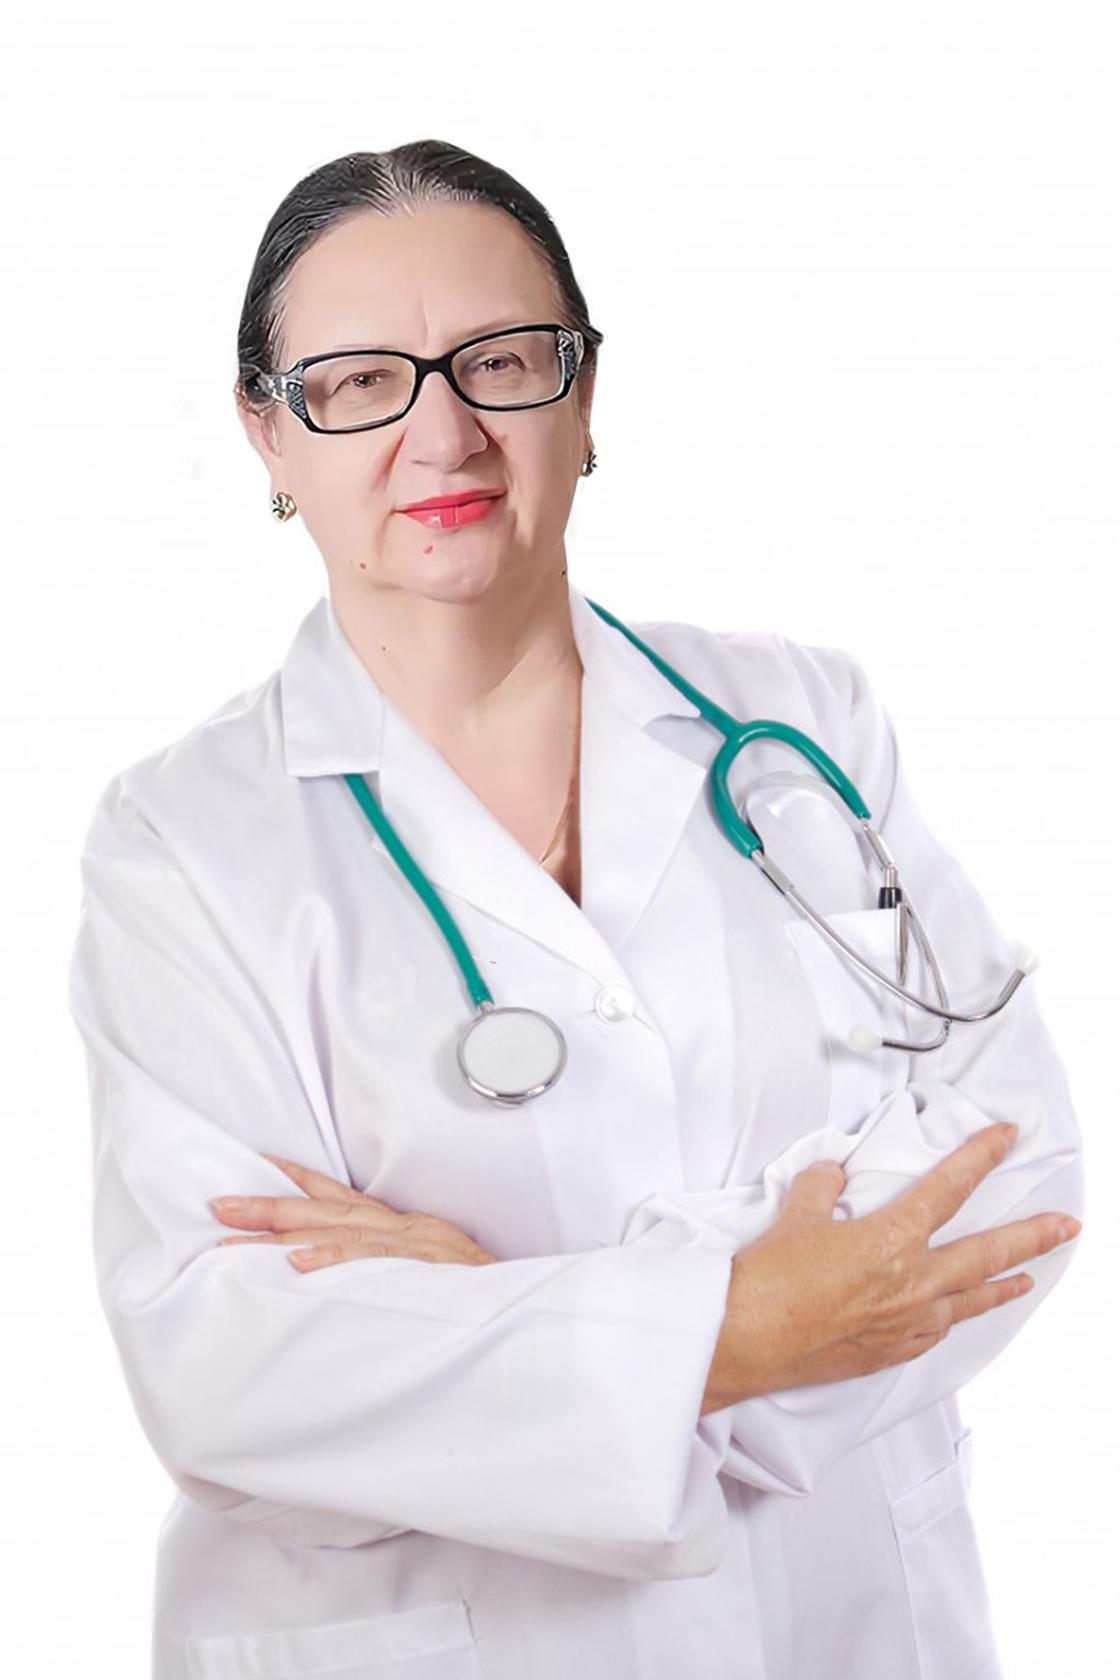 Нина Алексеевна Волошина. Акушер - гинеколог в ростове на дону